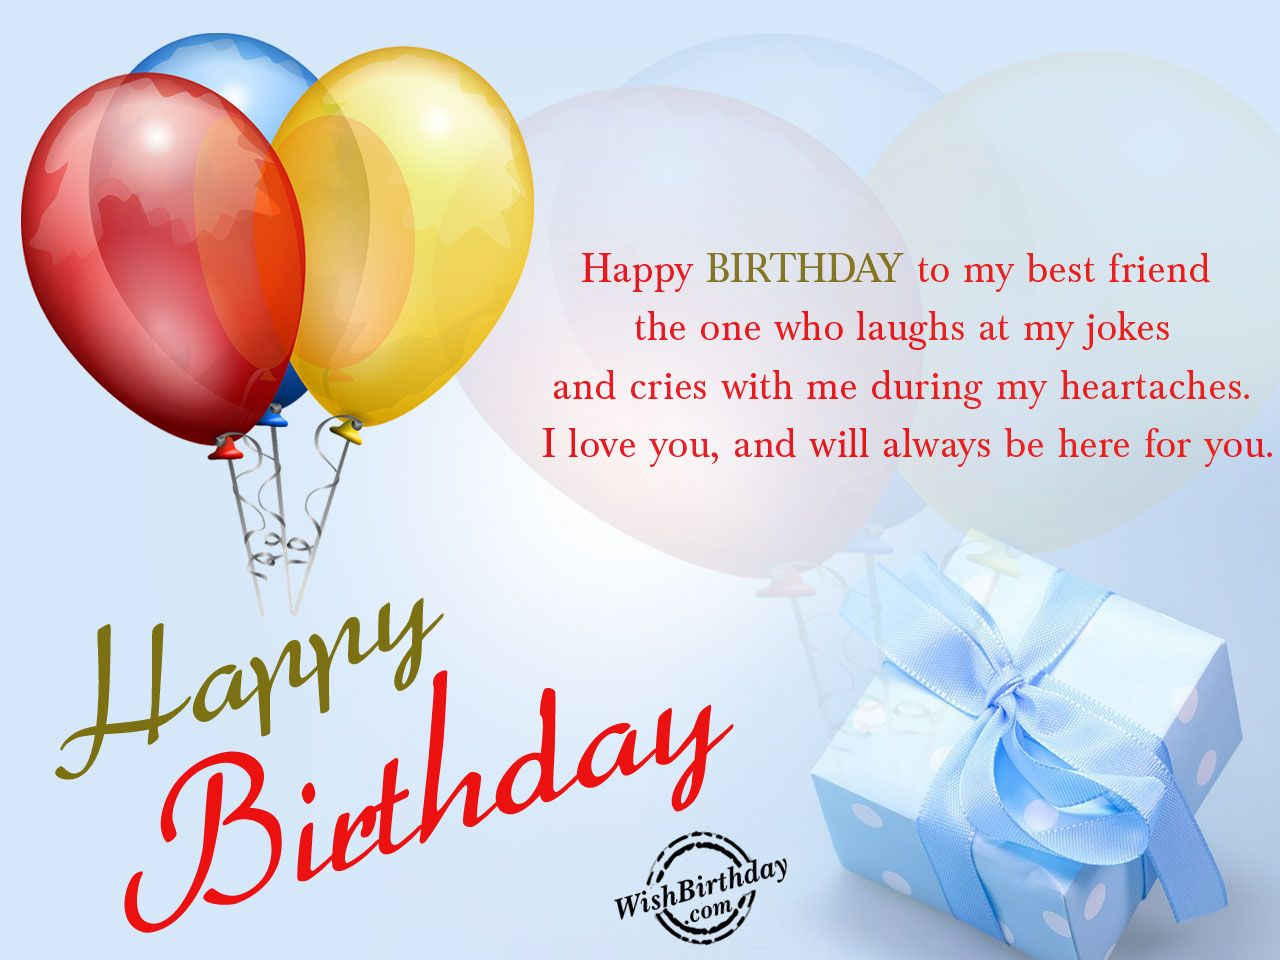 happy birthday messages for him friend my best friend